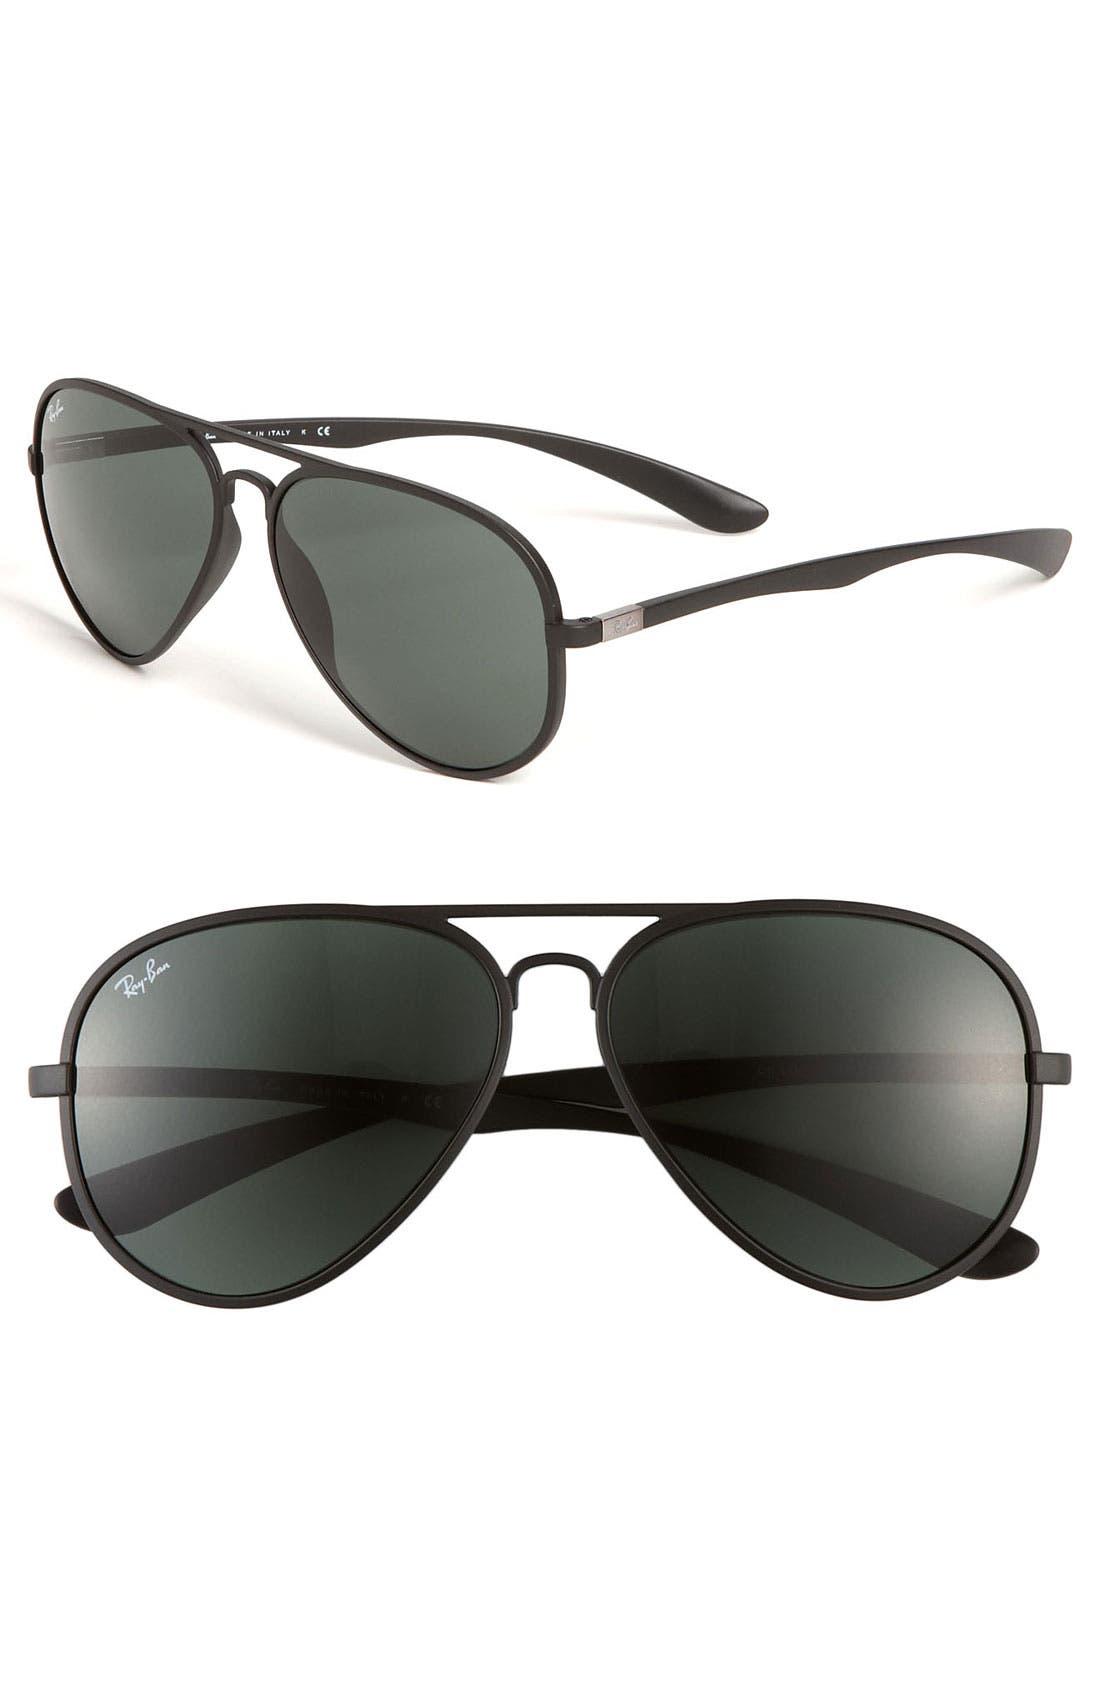 Main Image - Ray-Ban 'M Mod Caravan' 58mm Aviator Sunglasses